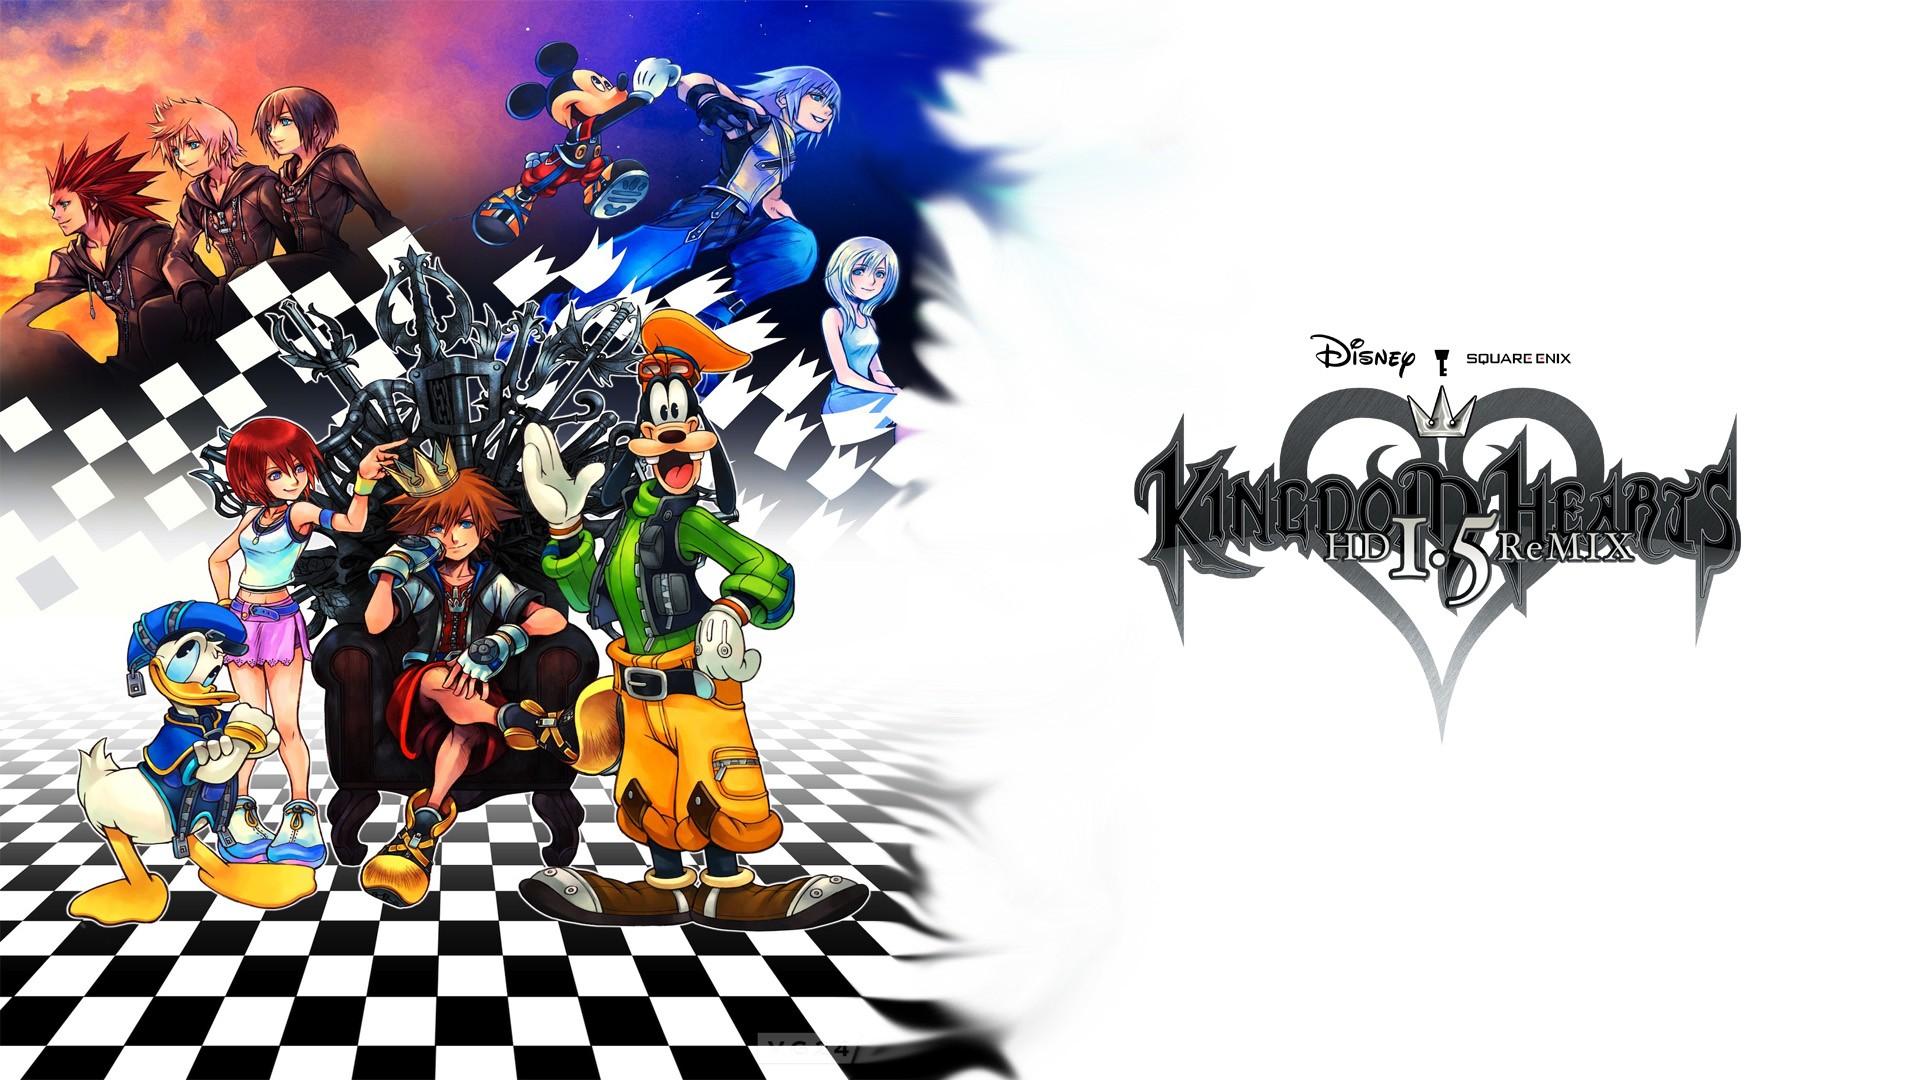 Hd Kingdom Hearts Wallpapers Group 1920x1080